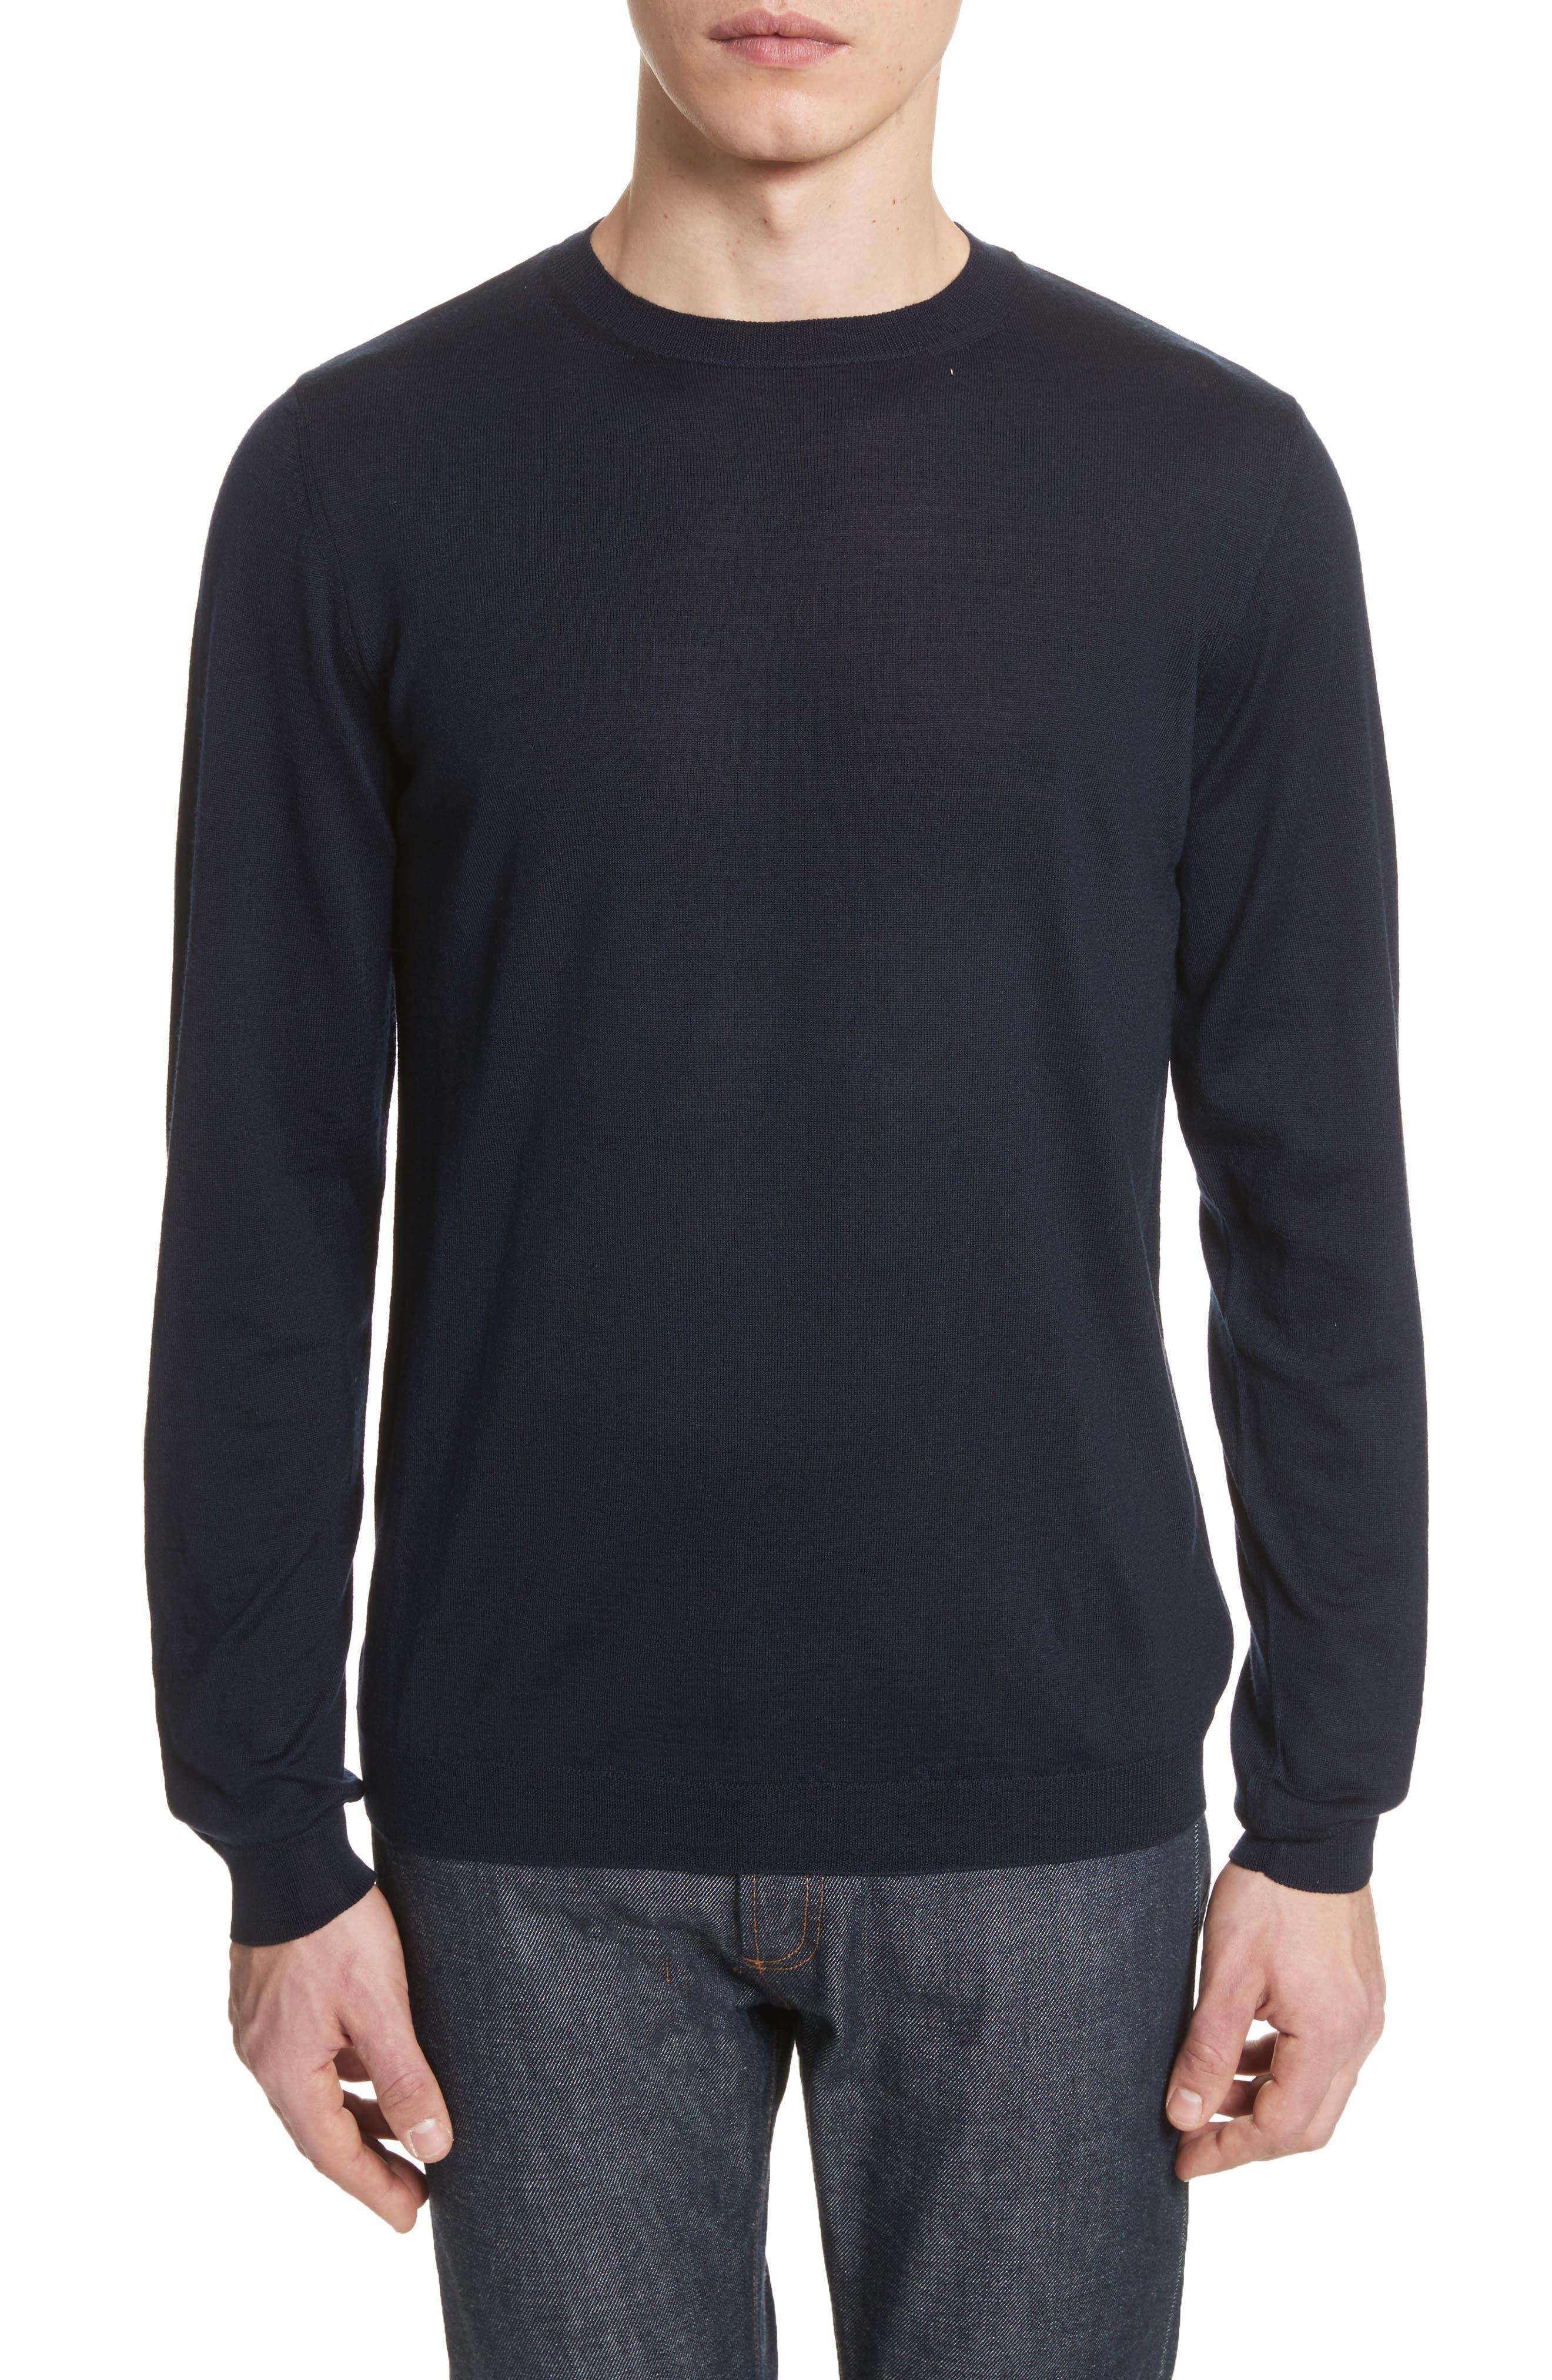 Designer Sweaters for Men | Nordstrom